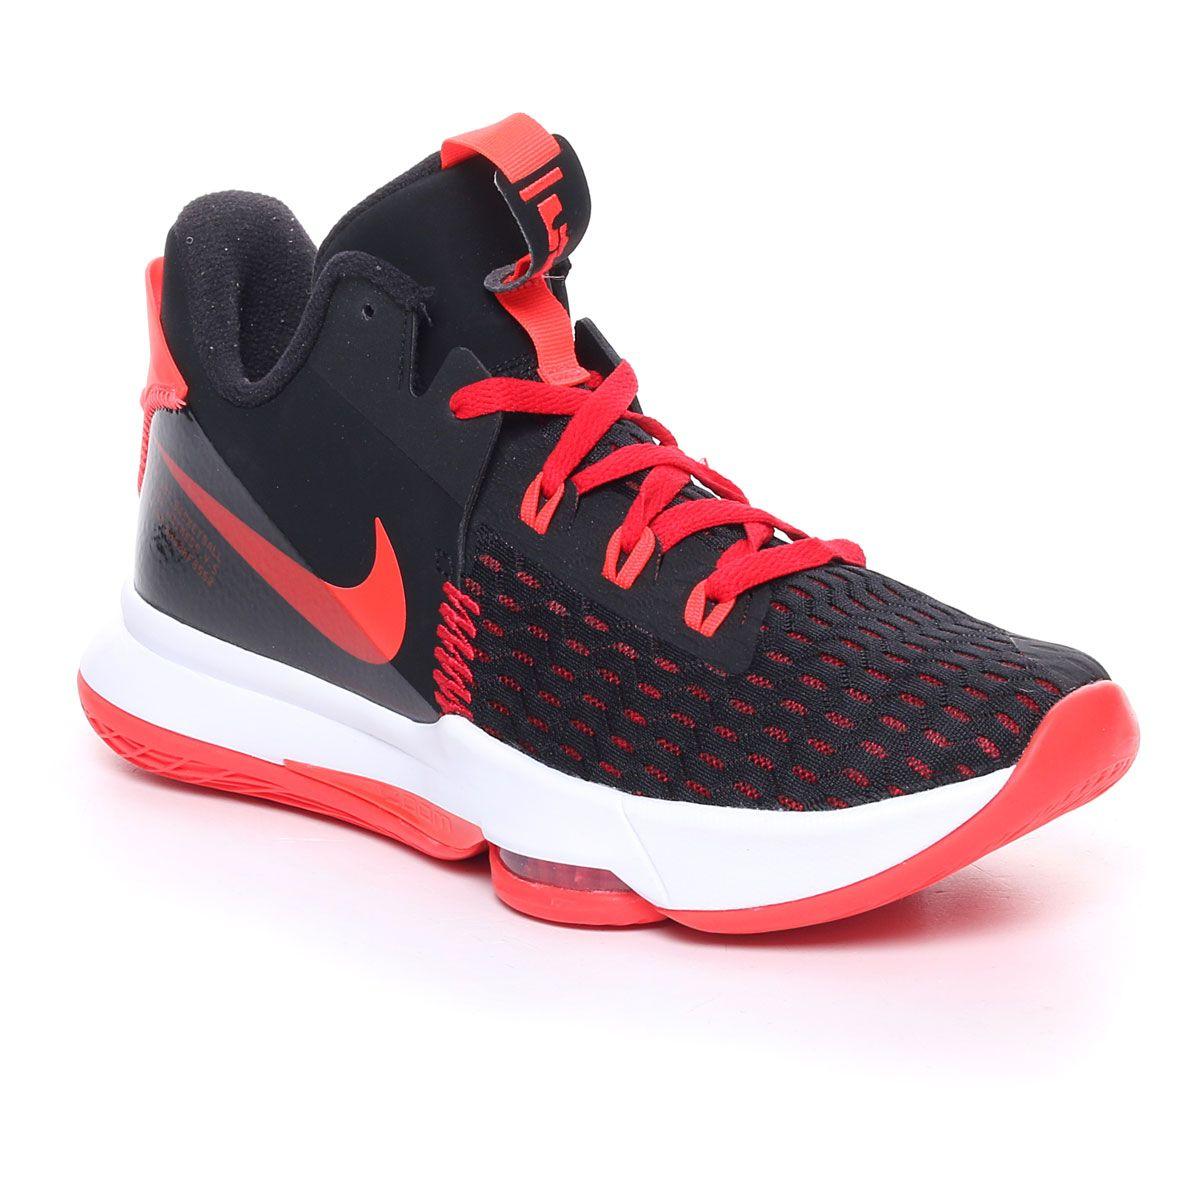 Nike Lebron Witness 5 Uomo Nero Rosso